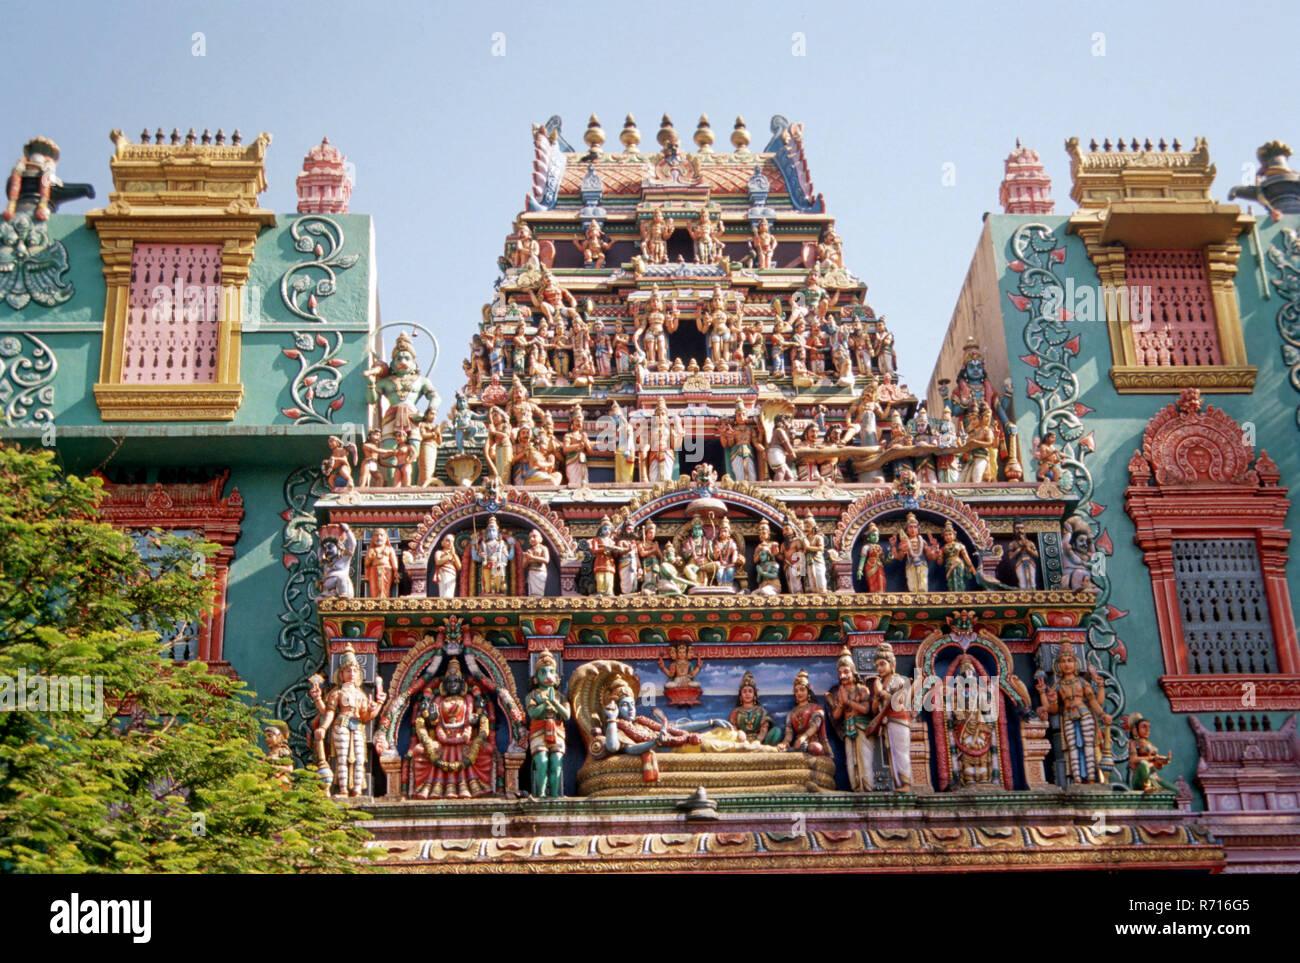 Shri Ram Mandir, Matunga, Bombay , Bombay, Maharashtra, India Foto de stock